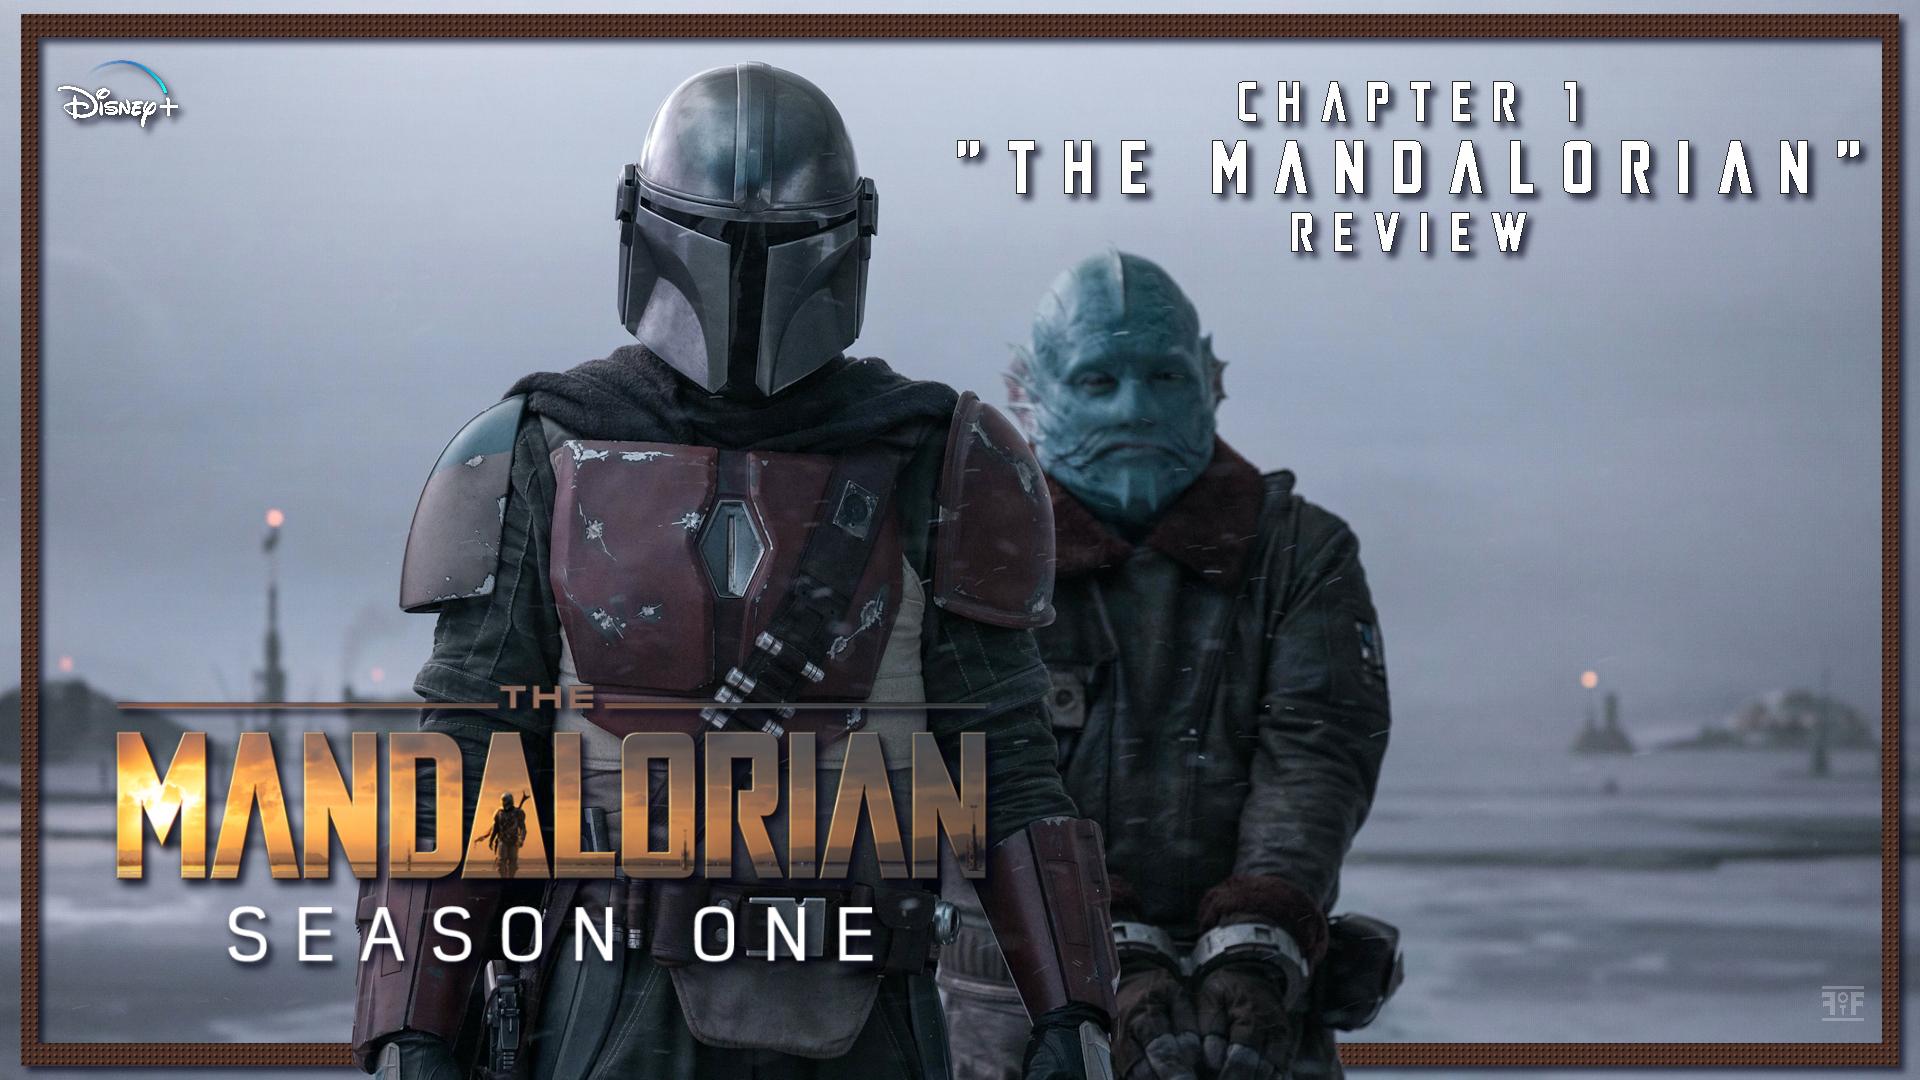 The Mandalorian: Chapter 1 'The Mandalorian'